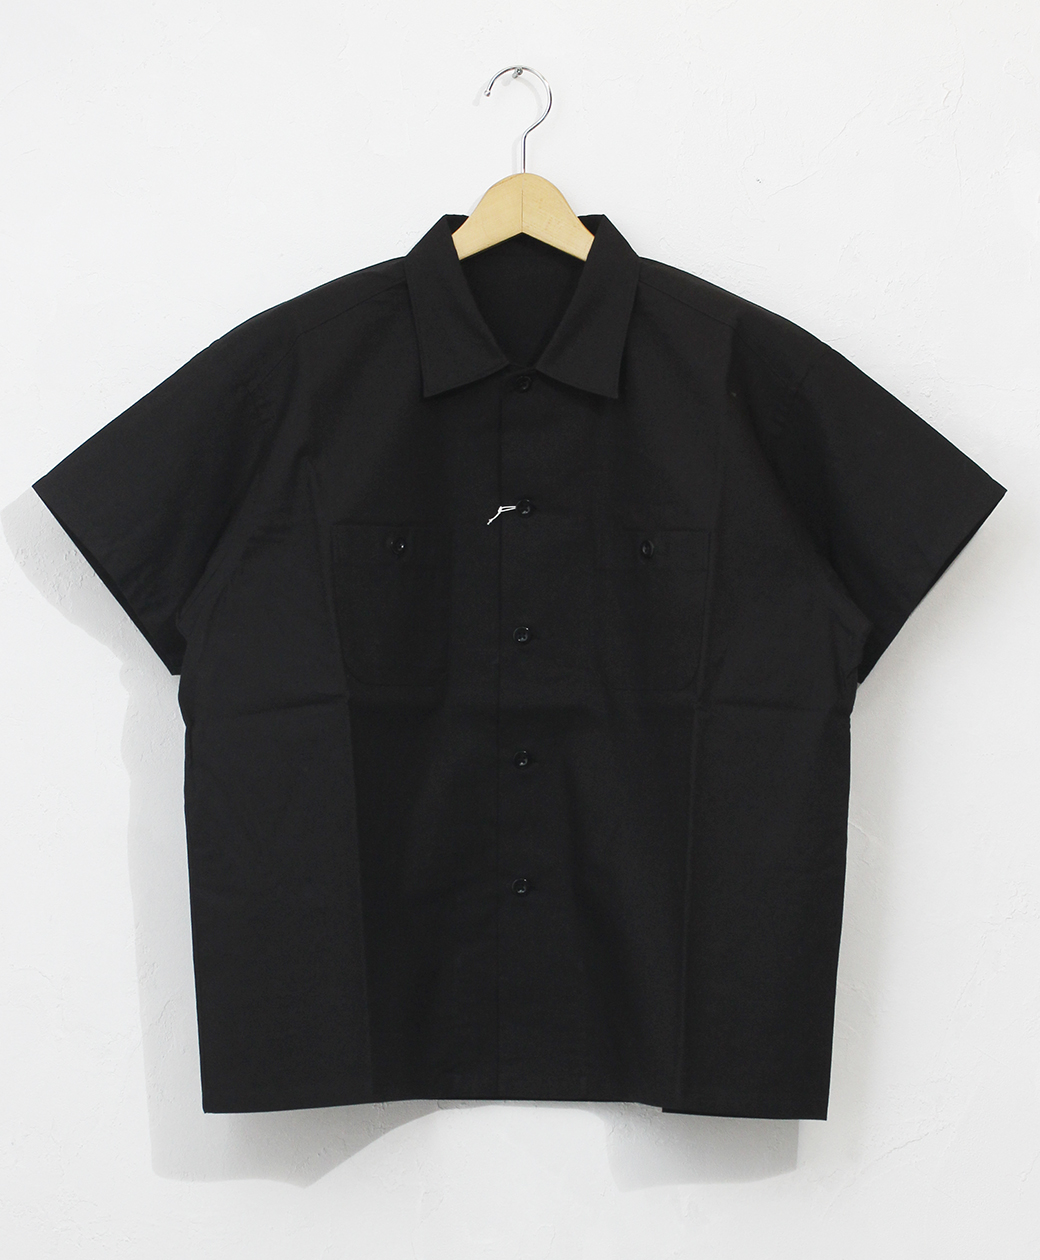 TUKI blouses(black)